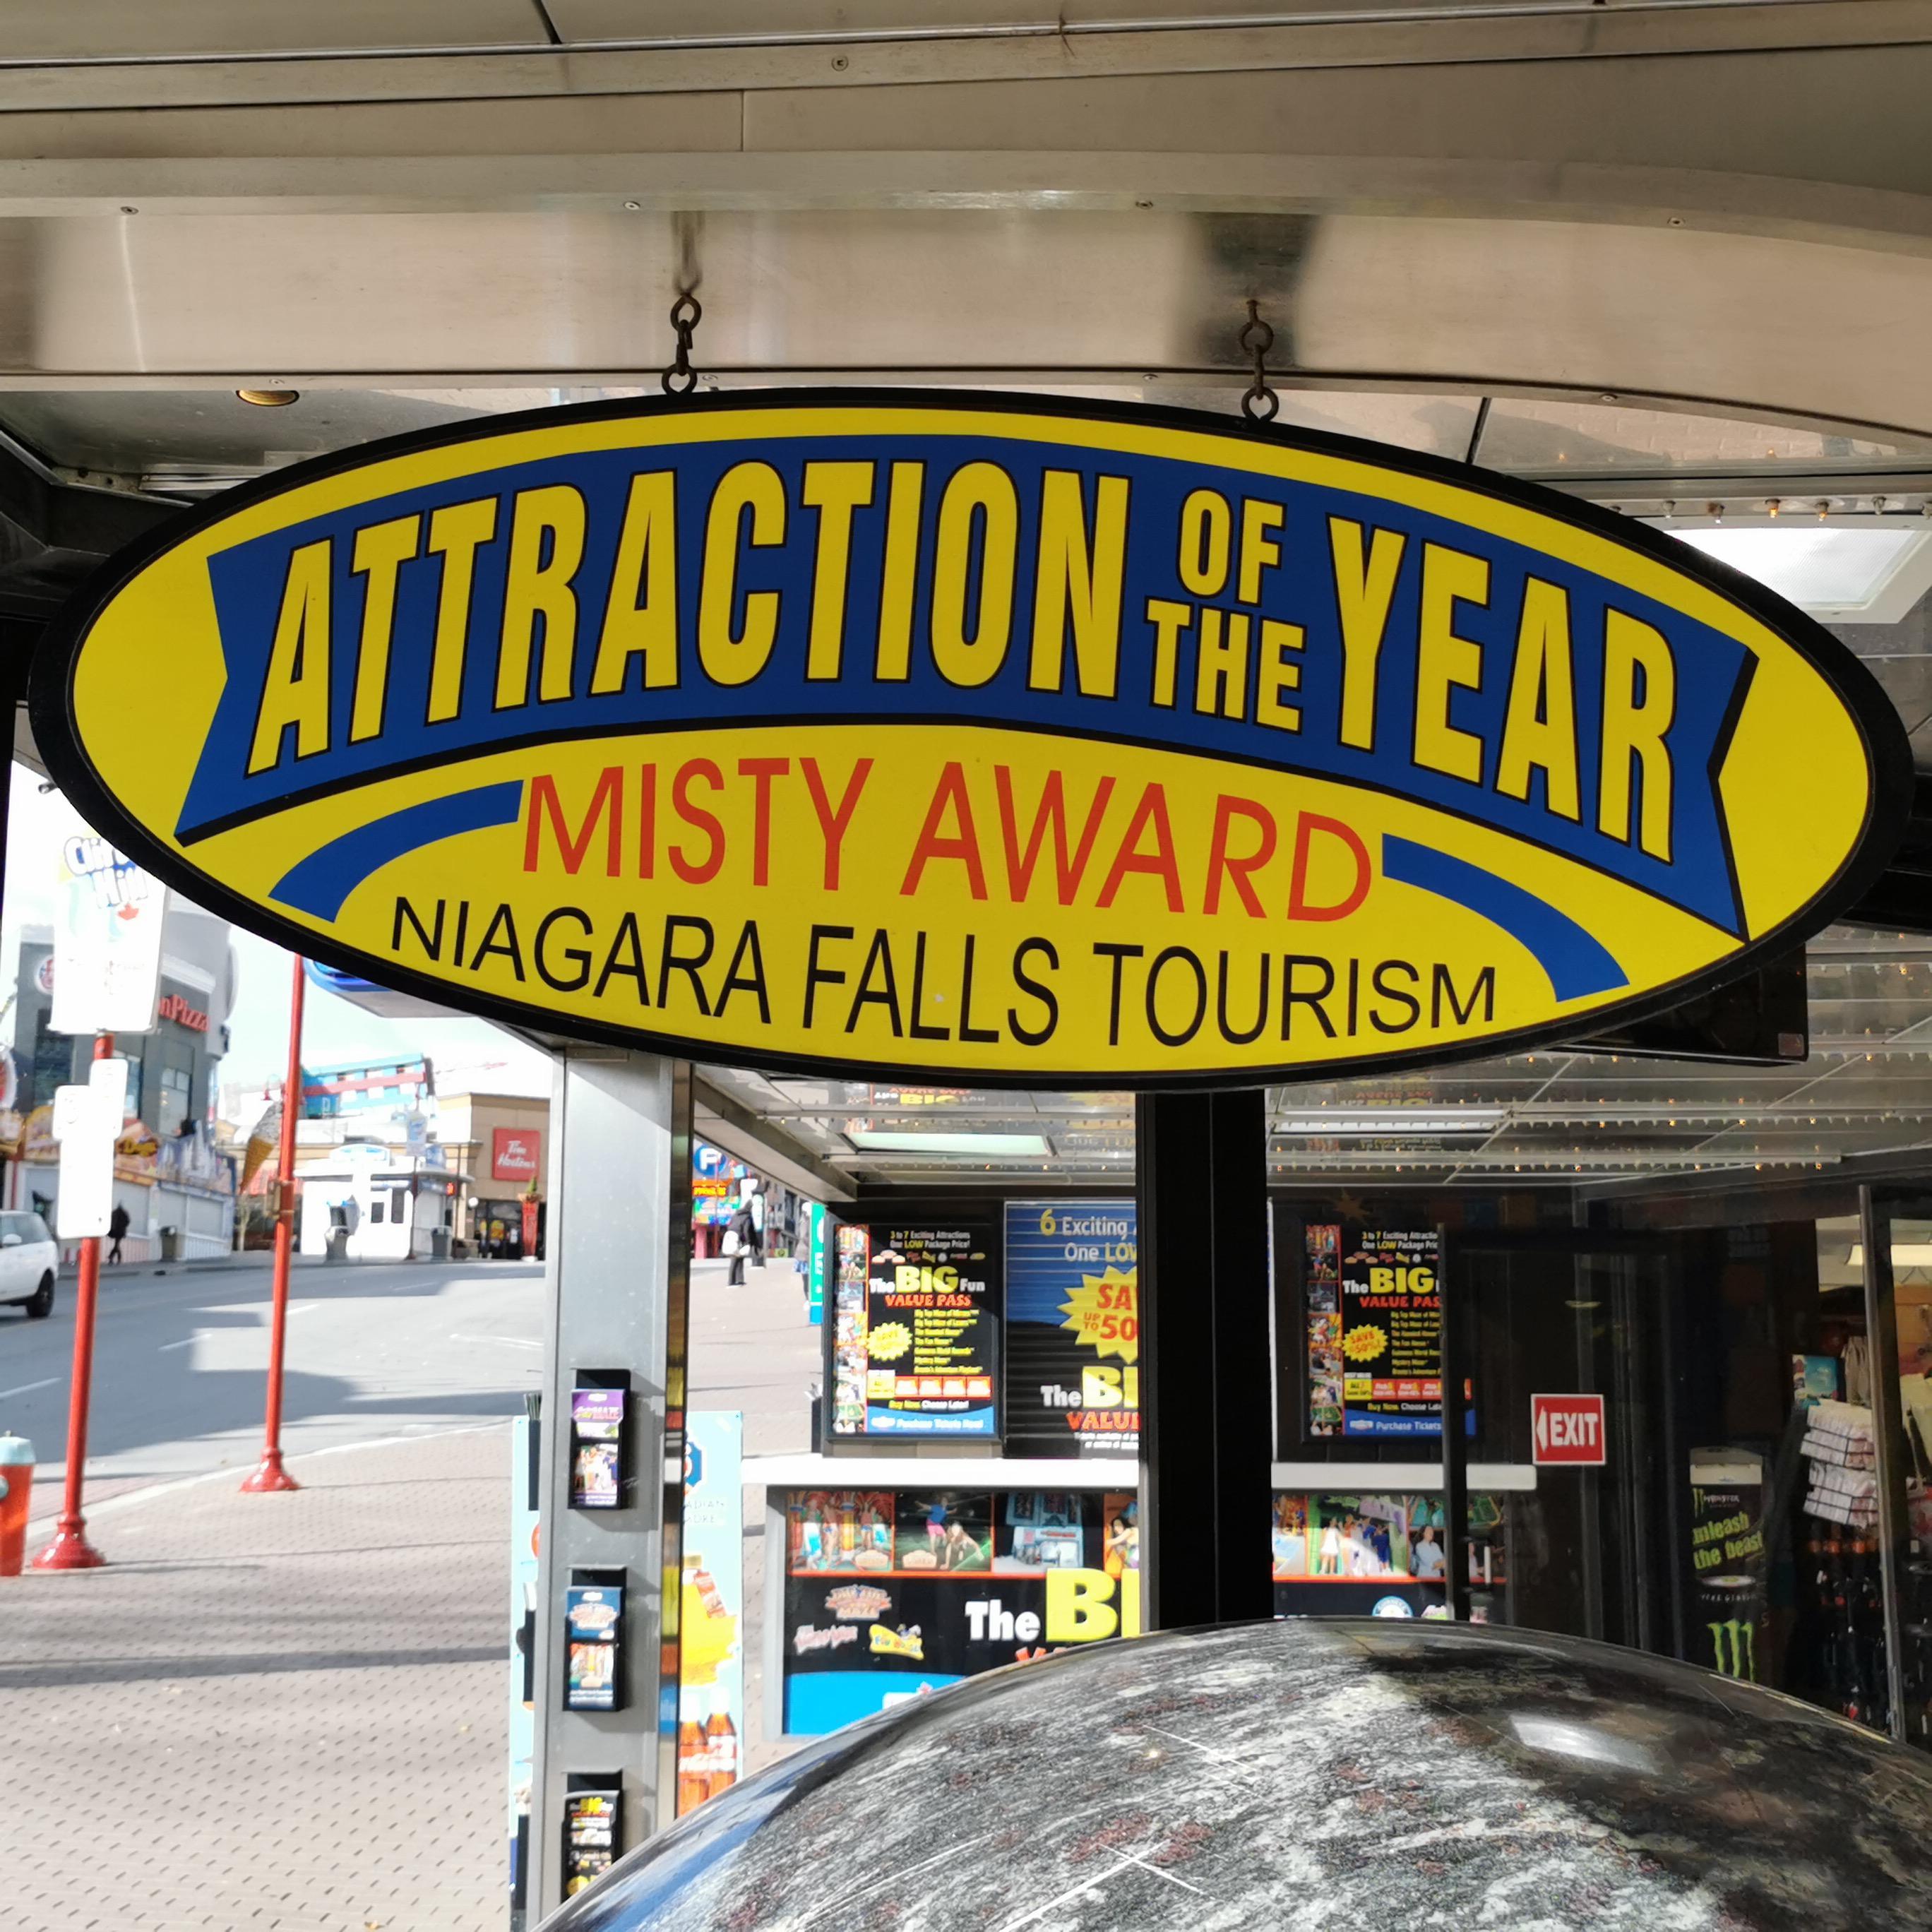 Guinness Museum Misty Awards Niagara Falls Memorabilia